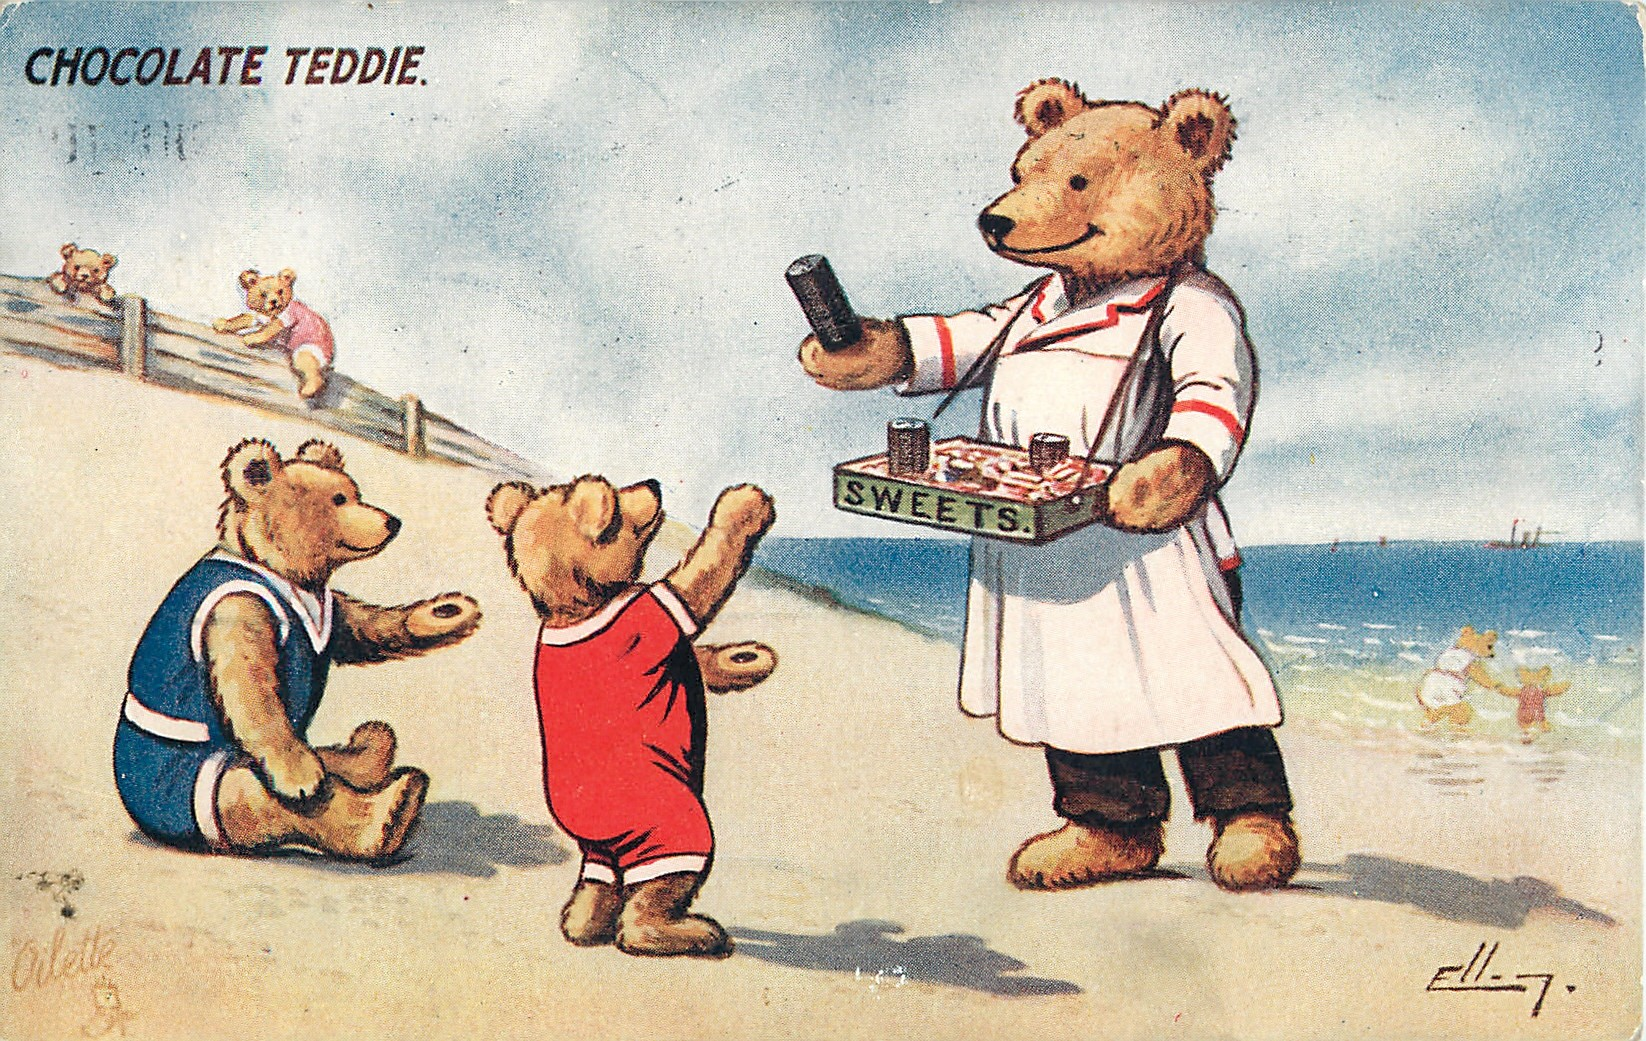 CHOCOLATE TEDDIE